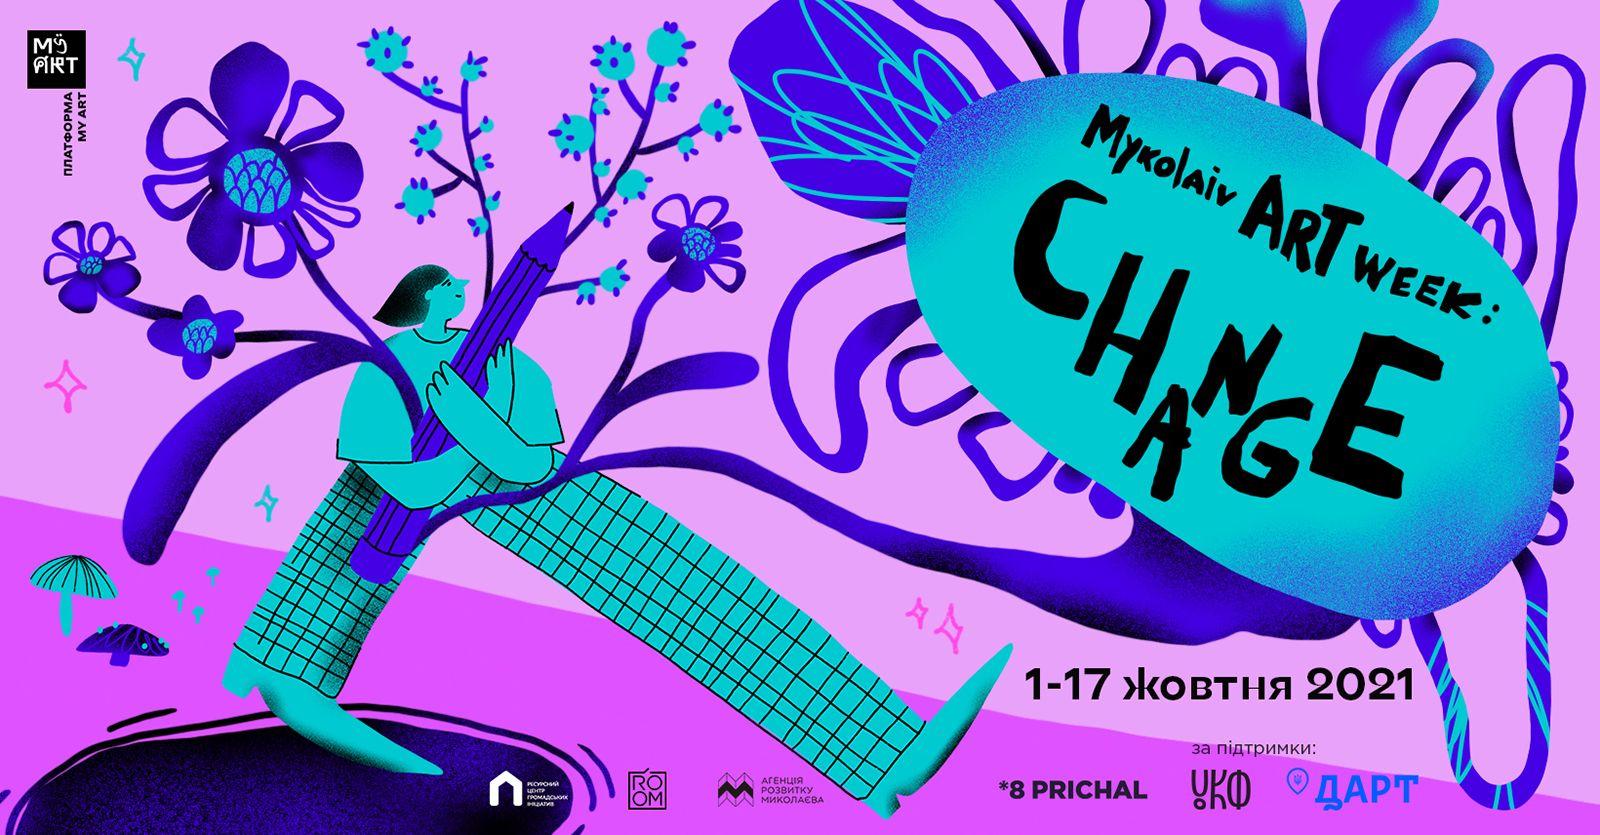 17 дней творчества в Николаеве: николаевцев приглашают на фестиваль Mykolaiv ART Week: CHANGE